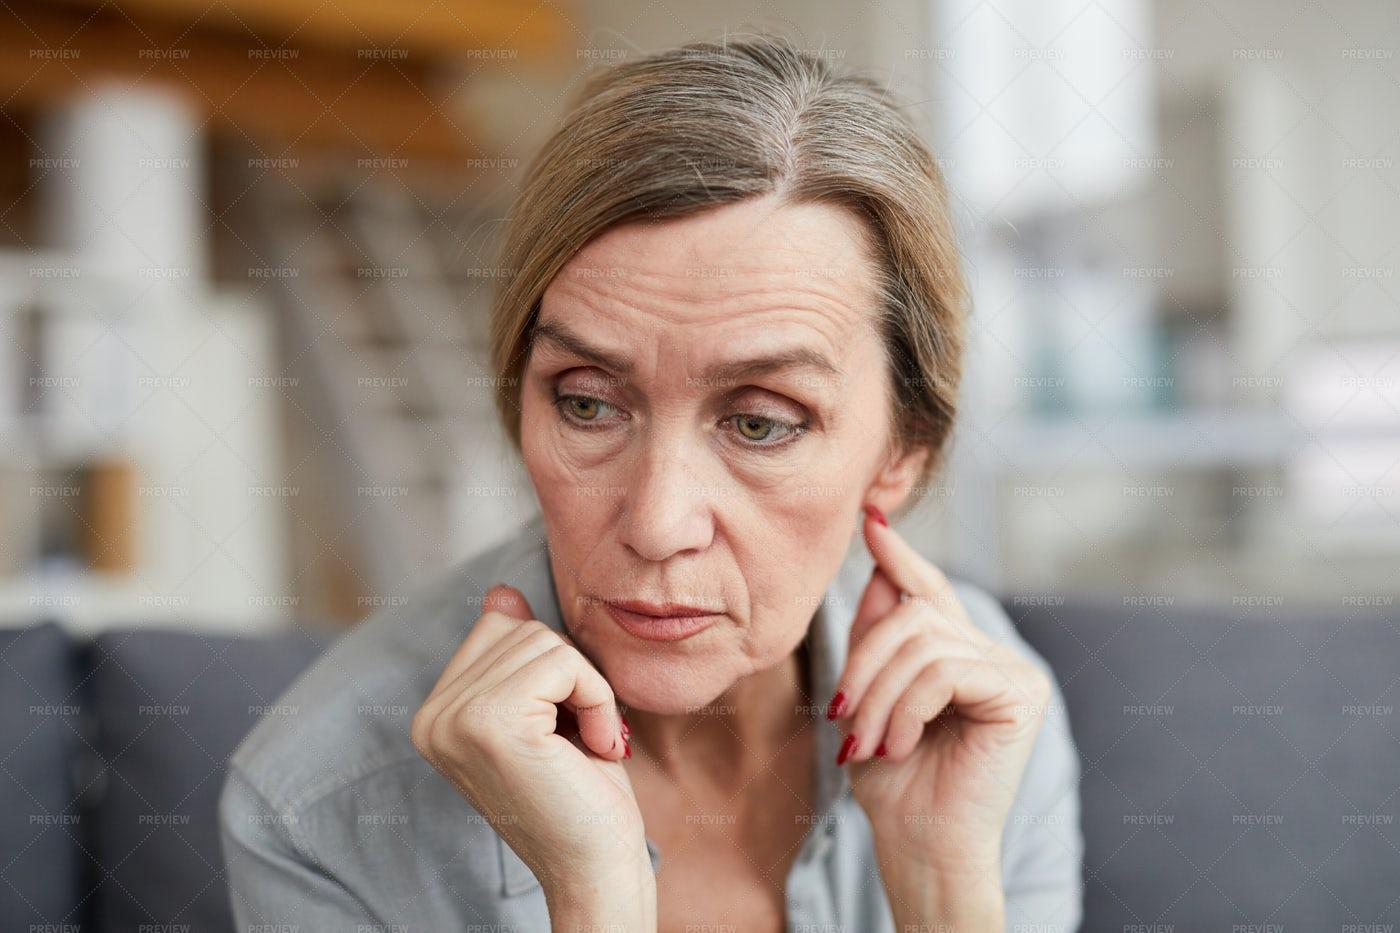 Portrait Of Worried Mature Woman: Stock Photos